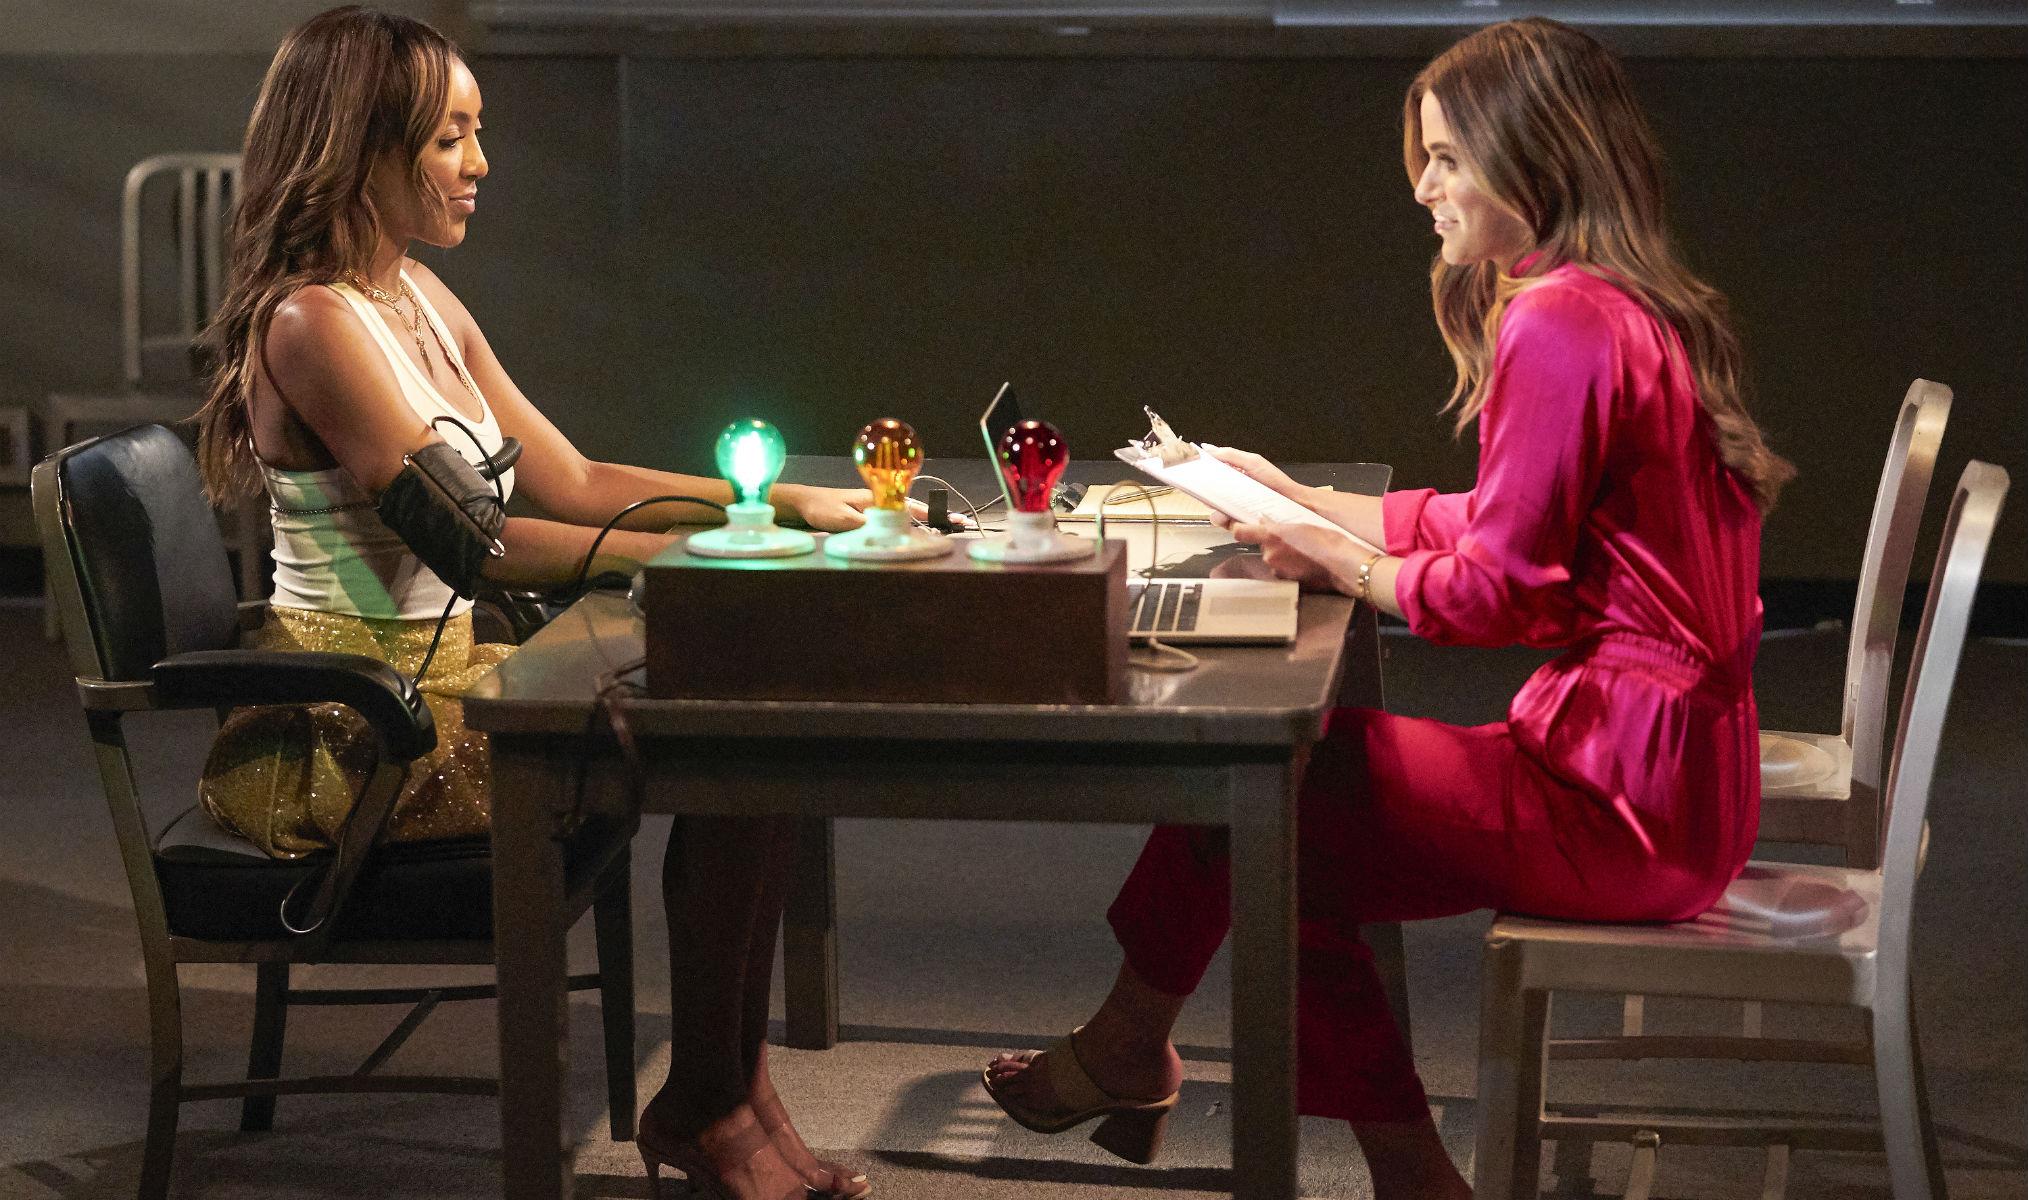 The Bachelorette Tayshia JoJo Episode 9